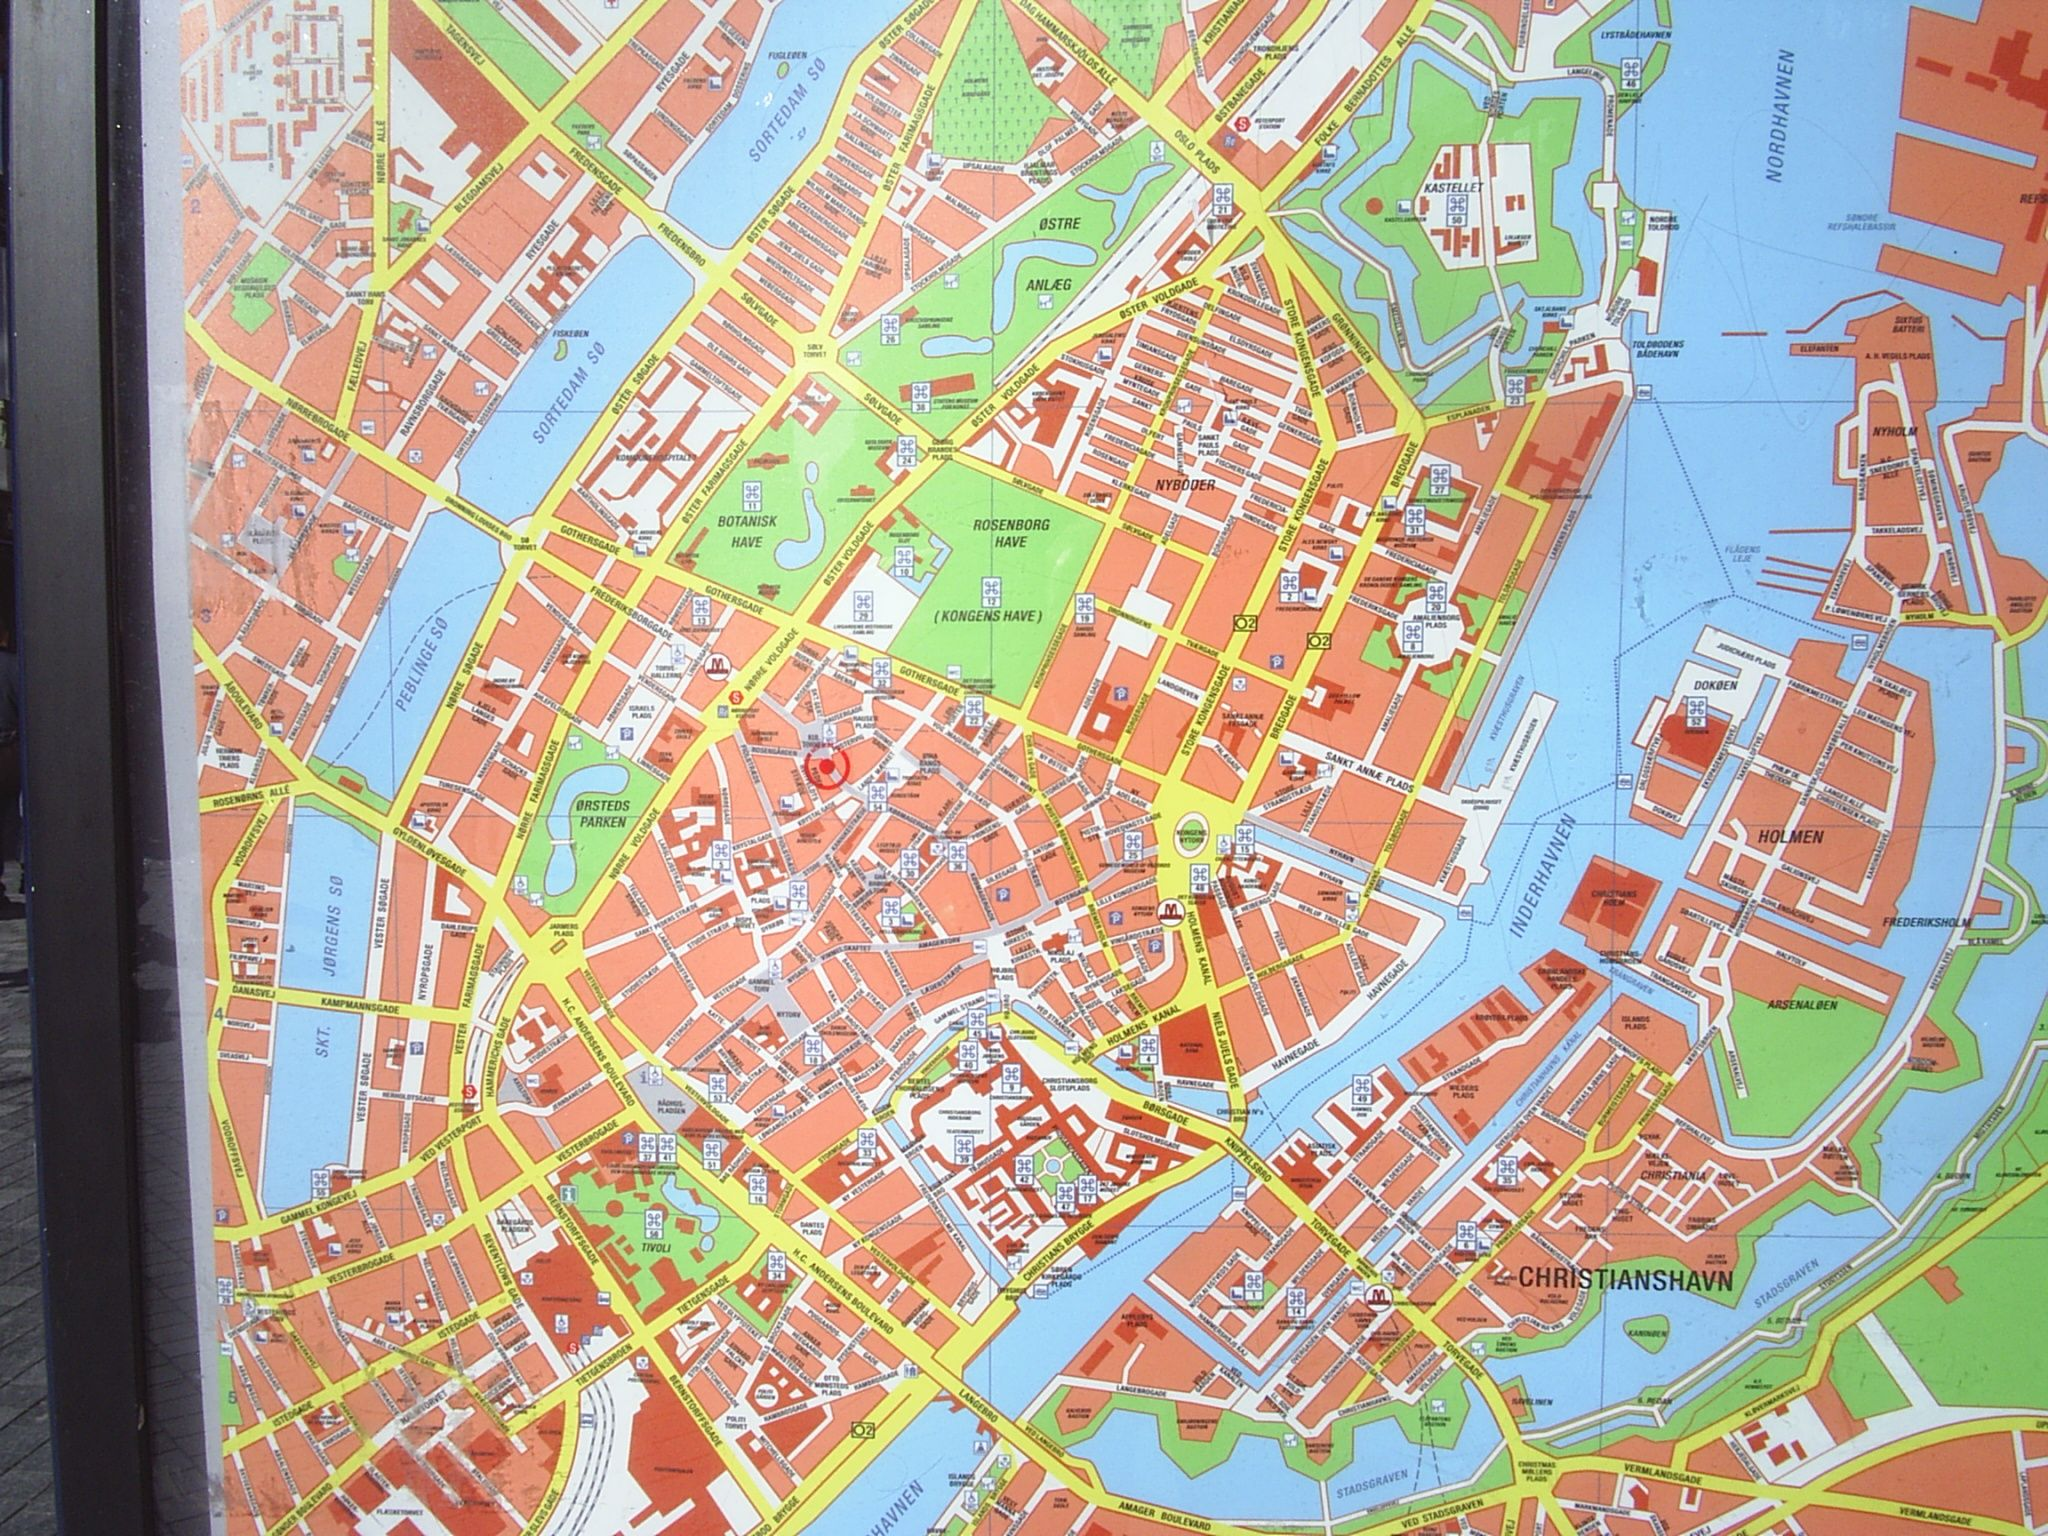 Experience Copenhagen – 1000 years of history on walk. The era of King Christian 4. Tour 3